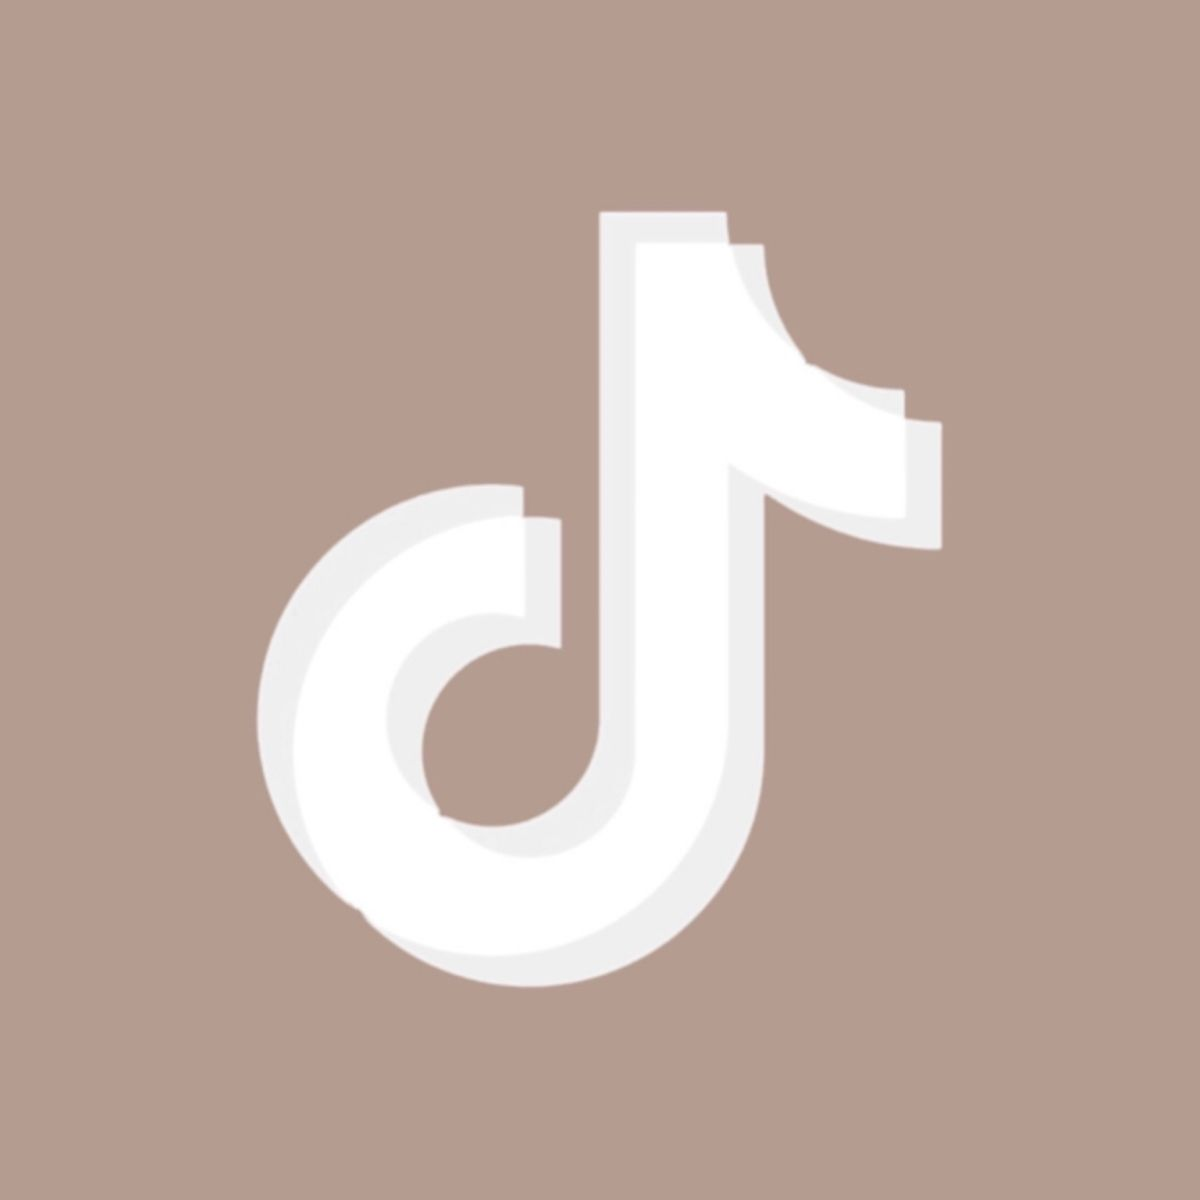 Tiktok App Icon Brown Aesthetic In 2021 App Icon App Brown Aesthetic